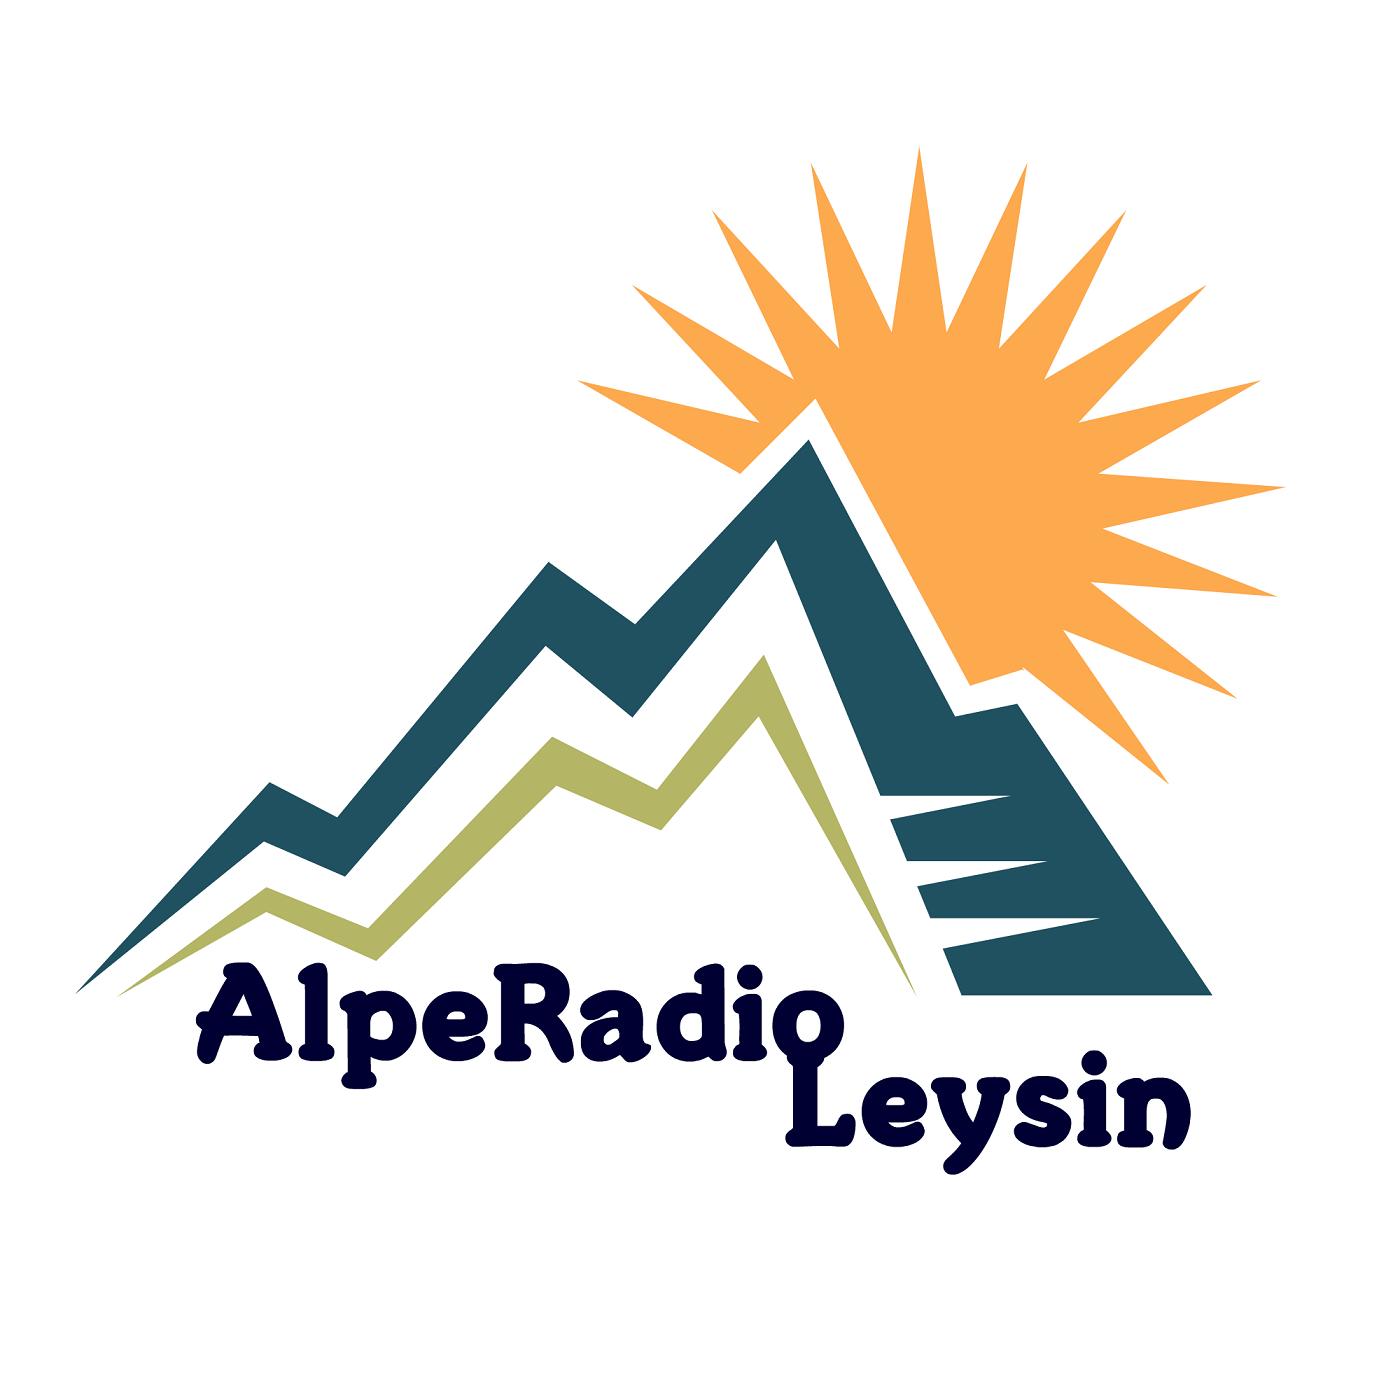 AlpeRadio Leysin